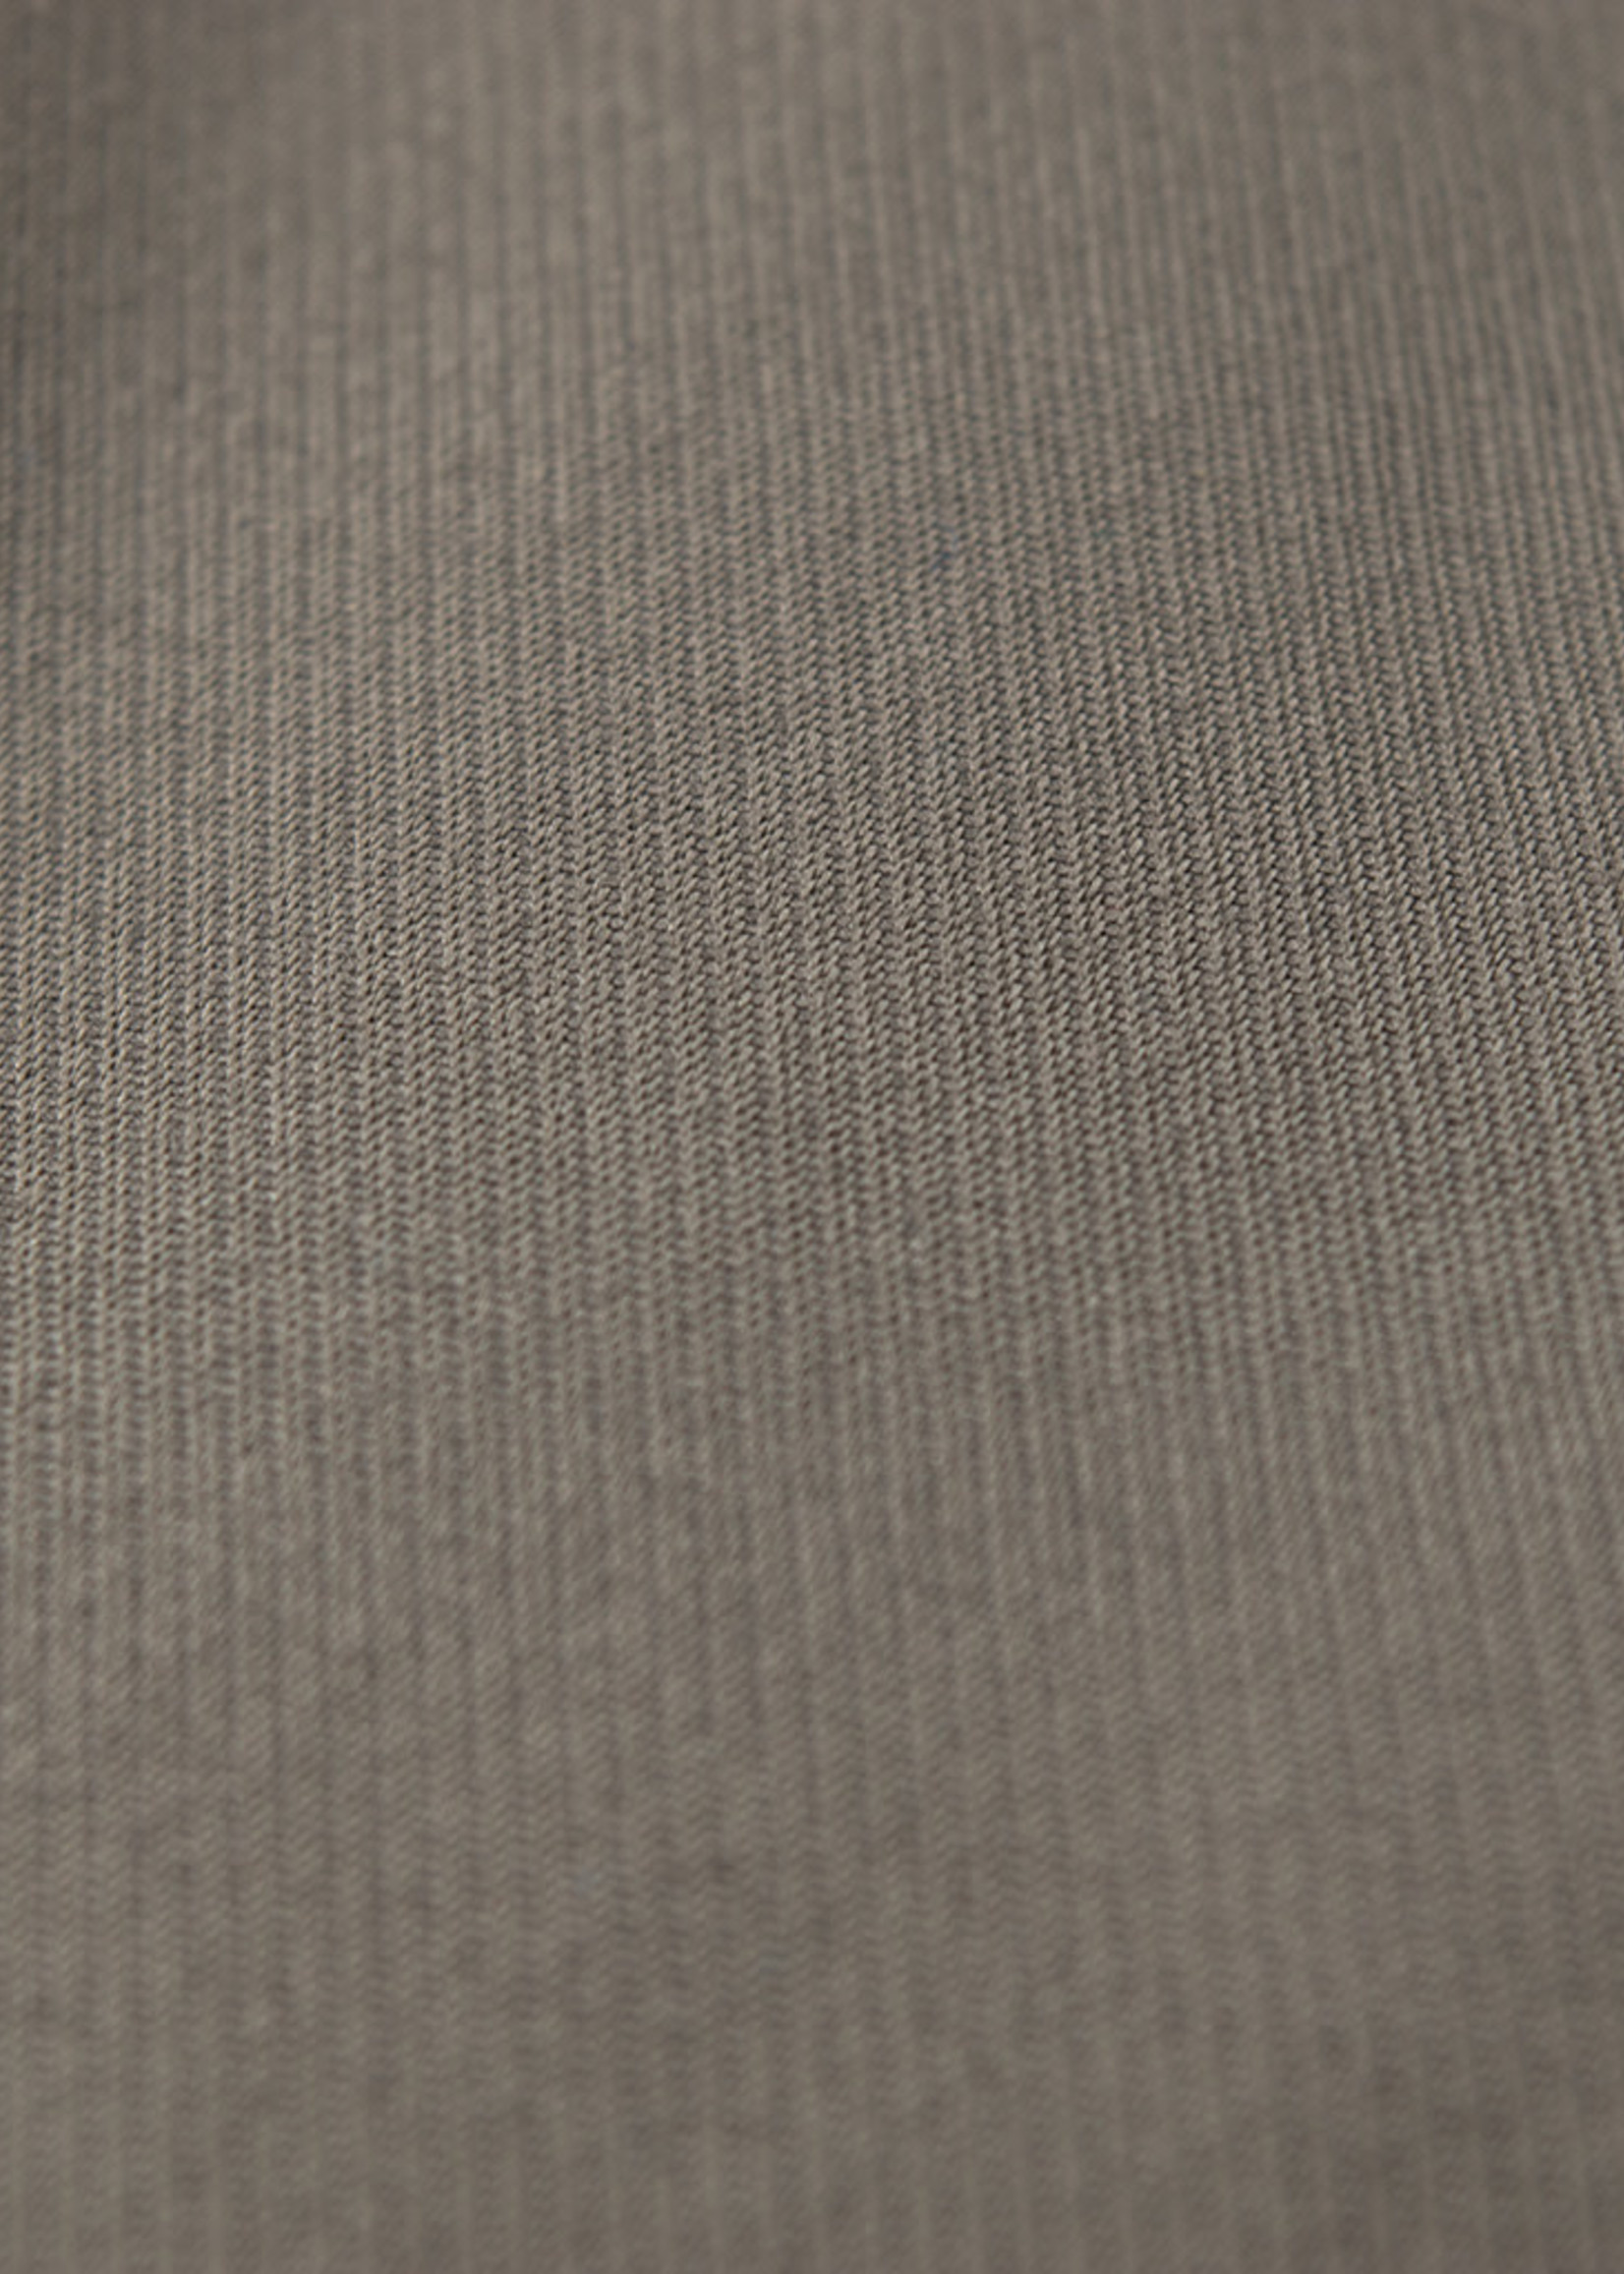 Hiltl Dayne Pant Taupe Tricotine Twill Cotton by Hiltl